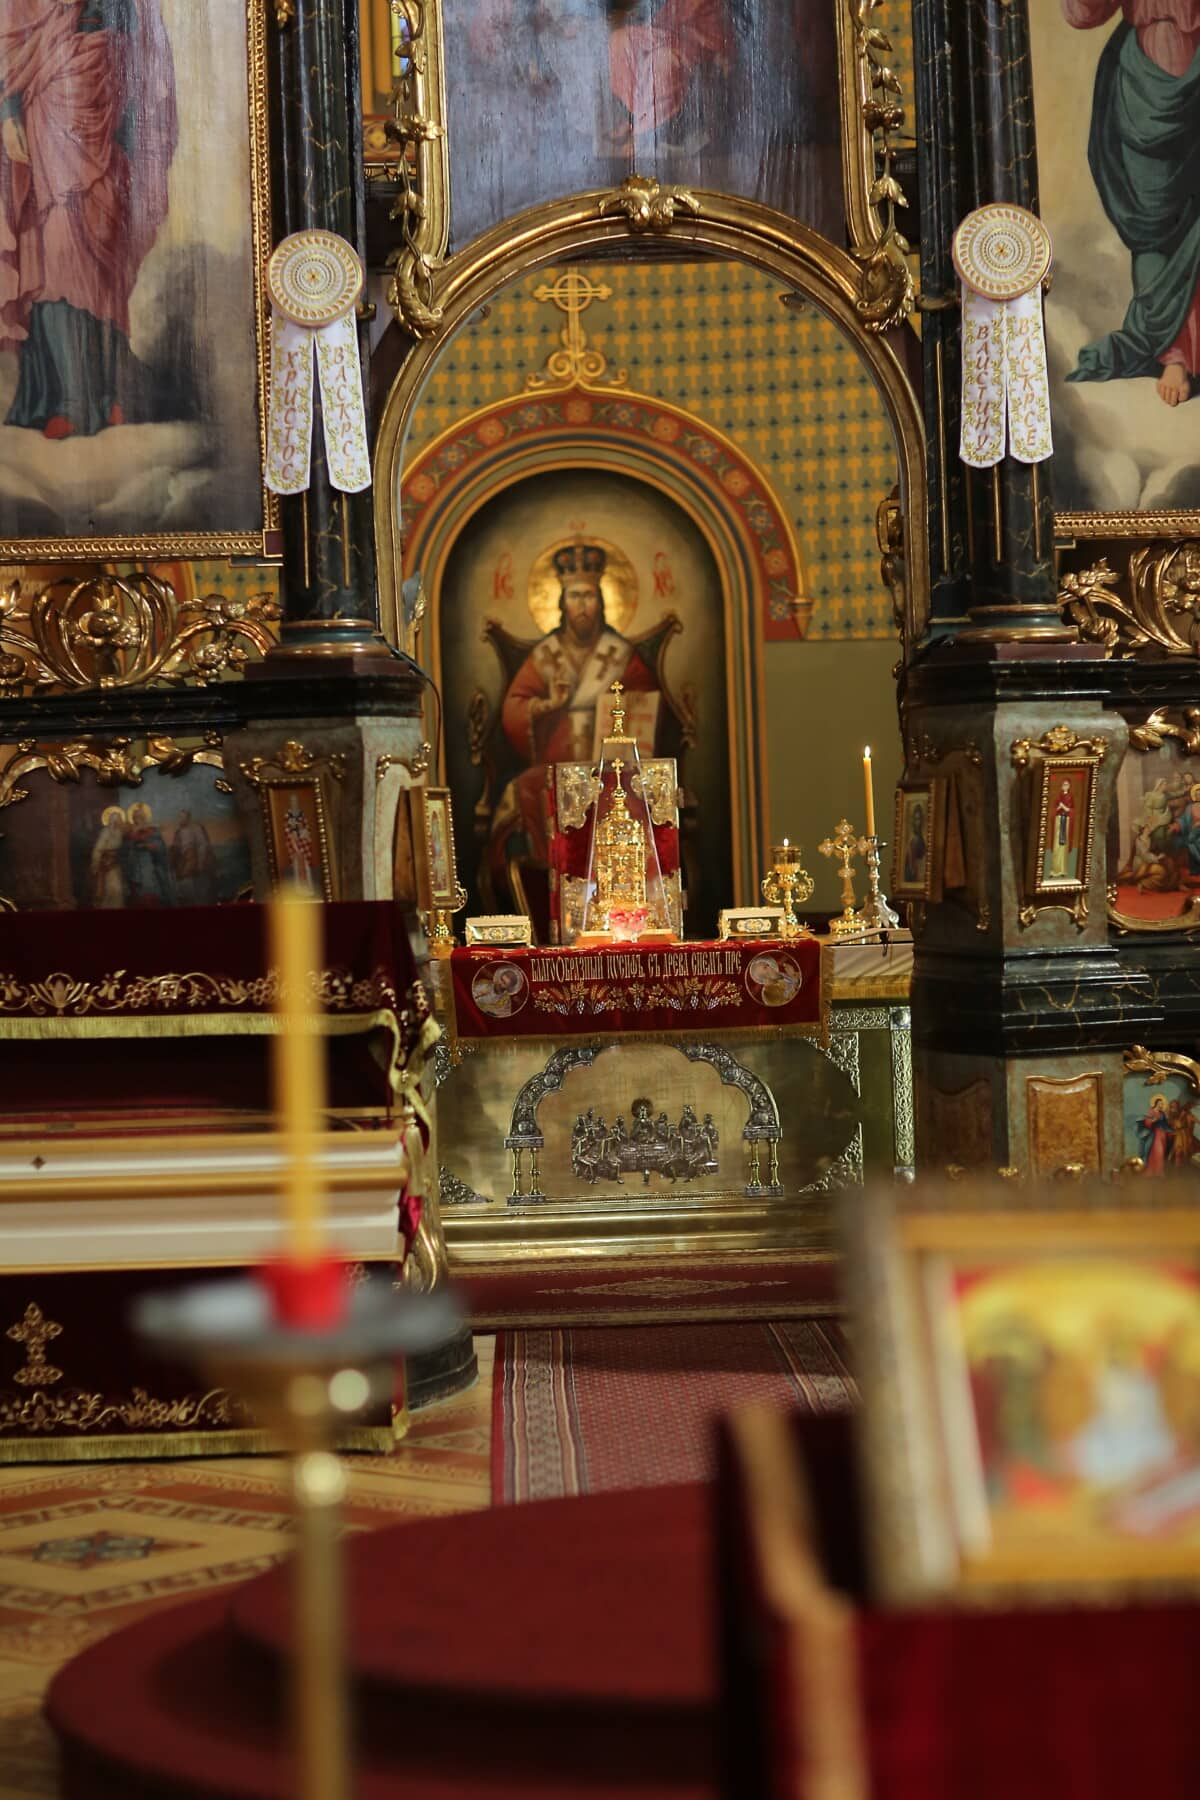 Symbol, Altar, Interieur-design, Kirche, Kloster, Russisch, orthodoxe, Religion, kathedrale